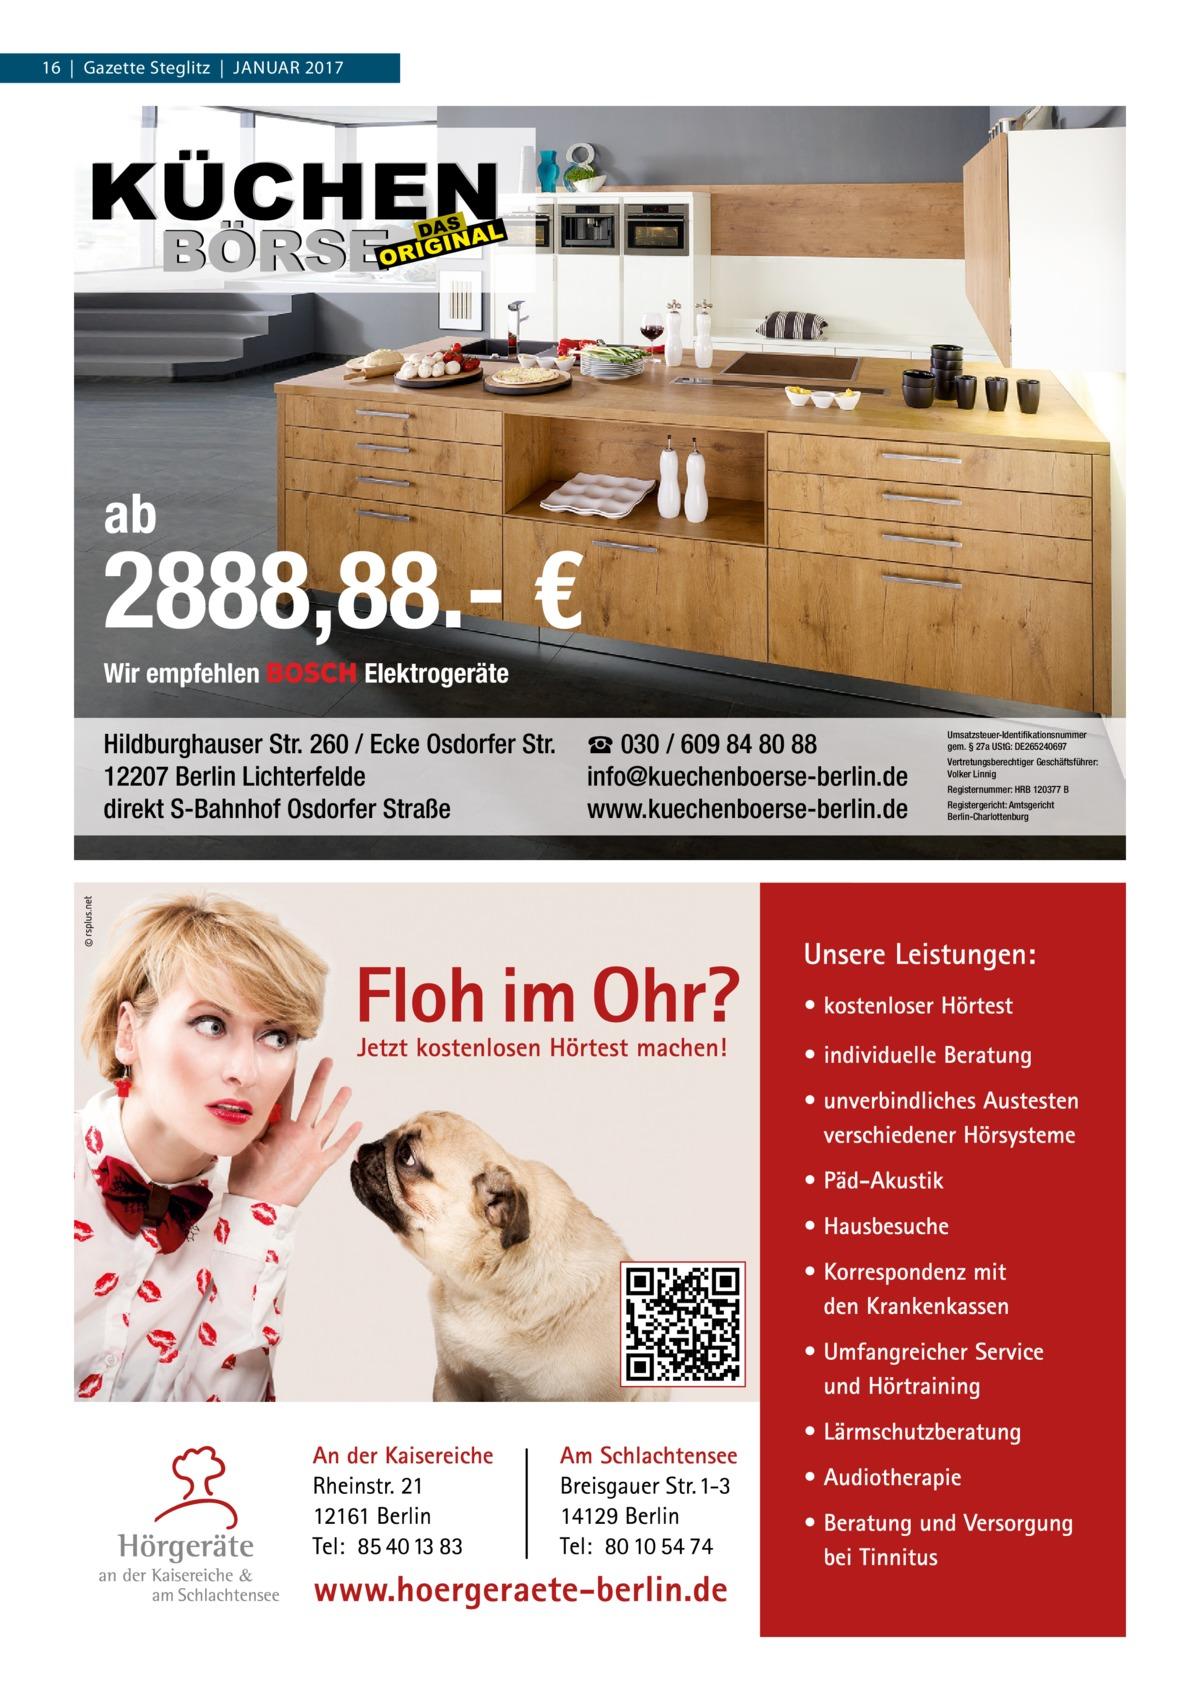 16|Gazette Steglitz|Januar 2017  ab  2888,88.- € Wir empfehlen  Elektrogeräte  Hildburghauser Str. 260 / Ecke Osdorfer Str. 12207 Berlin Lichterfelde direkt S-Bahnhof Osdorfer Straße  ☎ 030 / 609 84 80 88 info@kuechenboerse-berlin.de www.kuechenboerse-berlin.de  Umsatzsteuer-Identifikationsnummer gem. § 27a UStG: DE265240697 Vertretungsberechtiger Geschäftsführer: Volker Linnig Registernummer: HRB 120377 B Registergericht: Amtsgericht Berlin-Charlottenburg